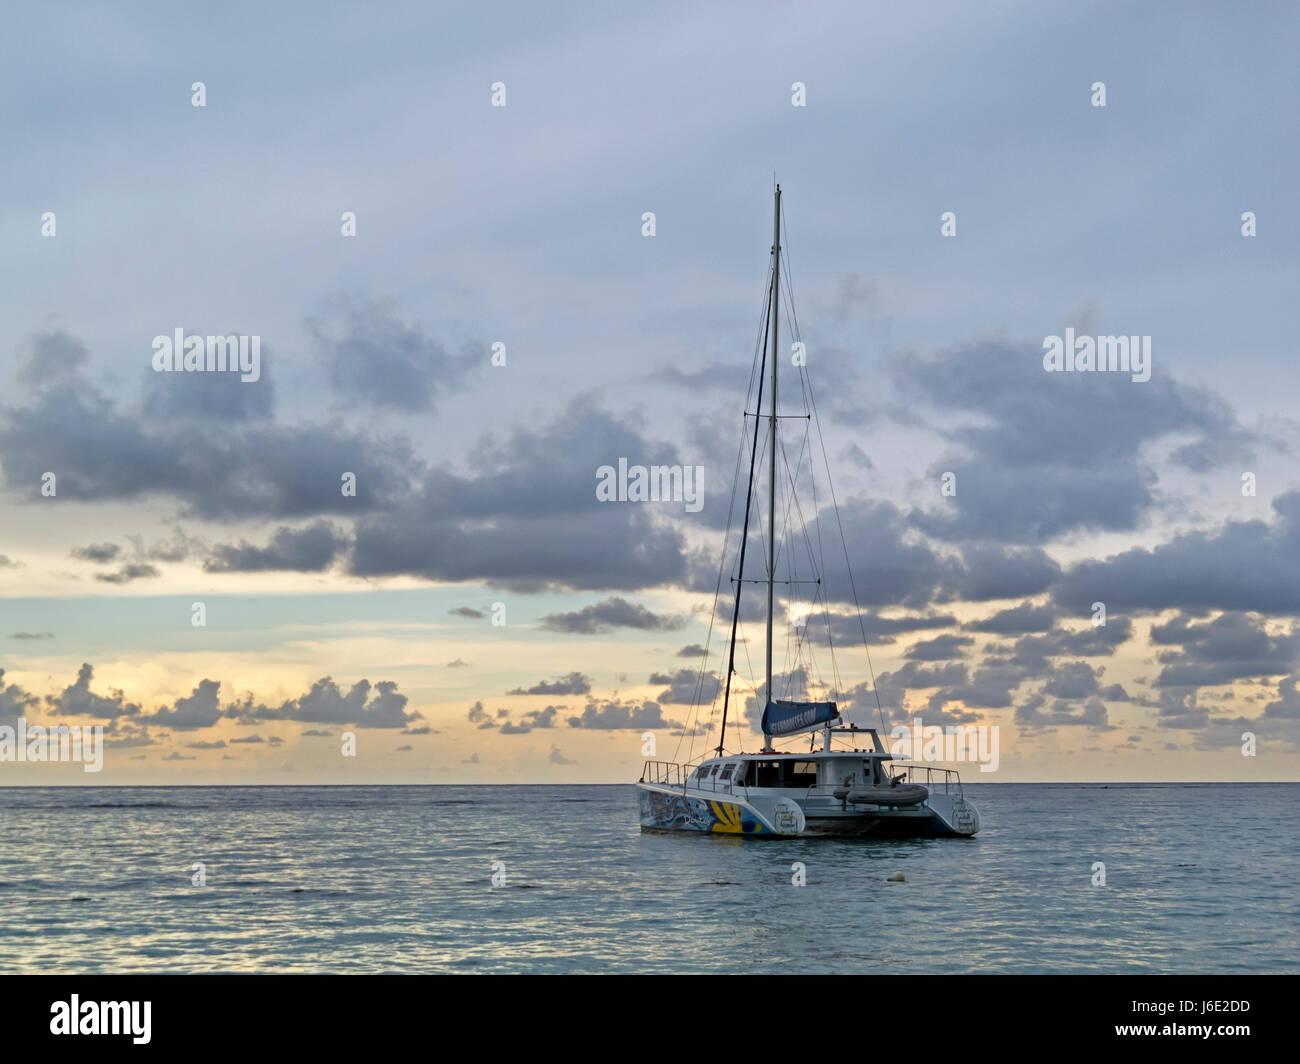 A Sailboat off the coast of Ocho Rios Jamaica - Stock Image